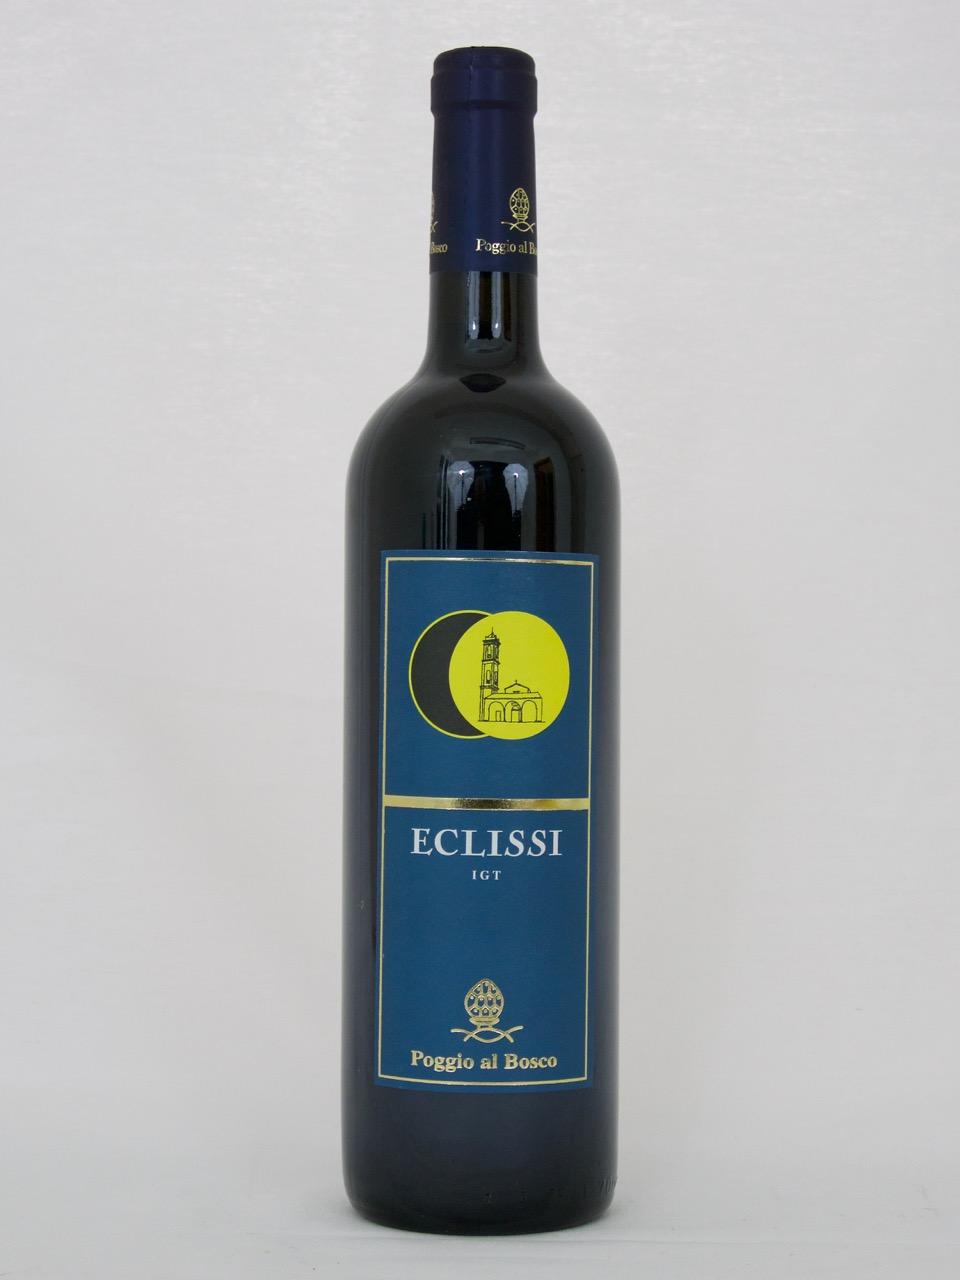 Eclissi IGT 2011 (13,5%Vol) <br /> Poggio al Bosco